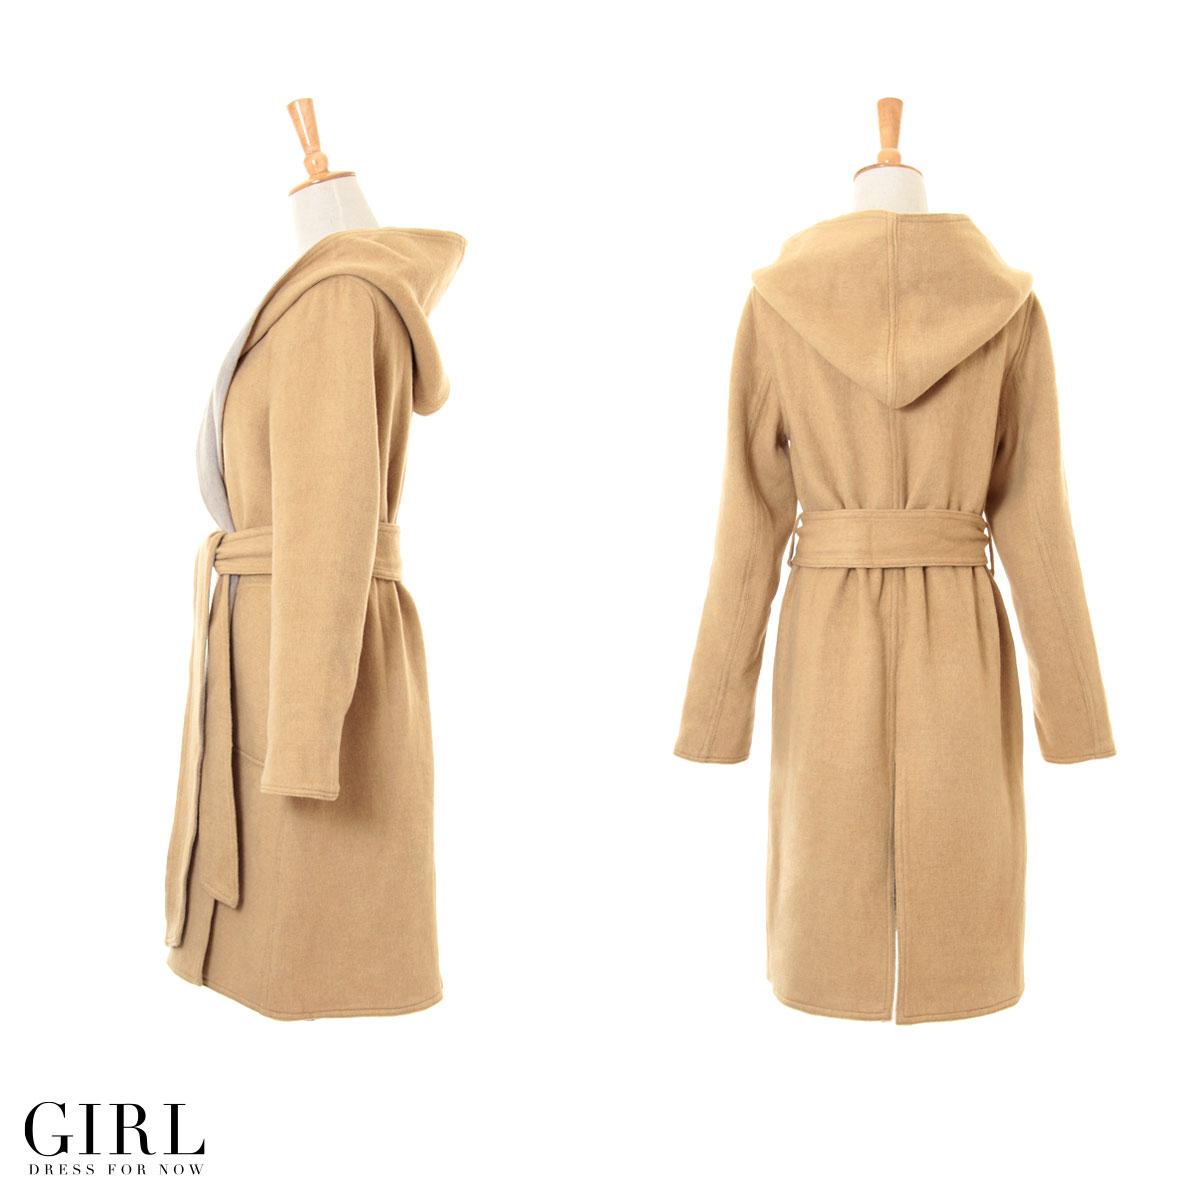 Coat River Court gowns women's coat outerwear winter autumn/winter jacket casual dress one piece beige Navy Black S M L 2 l LL XL wool reversible